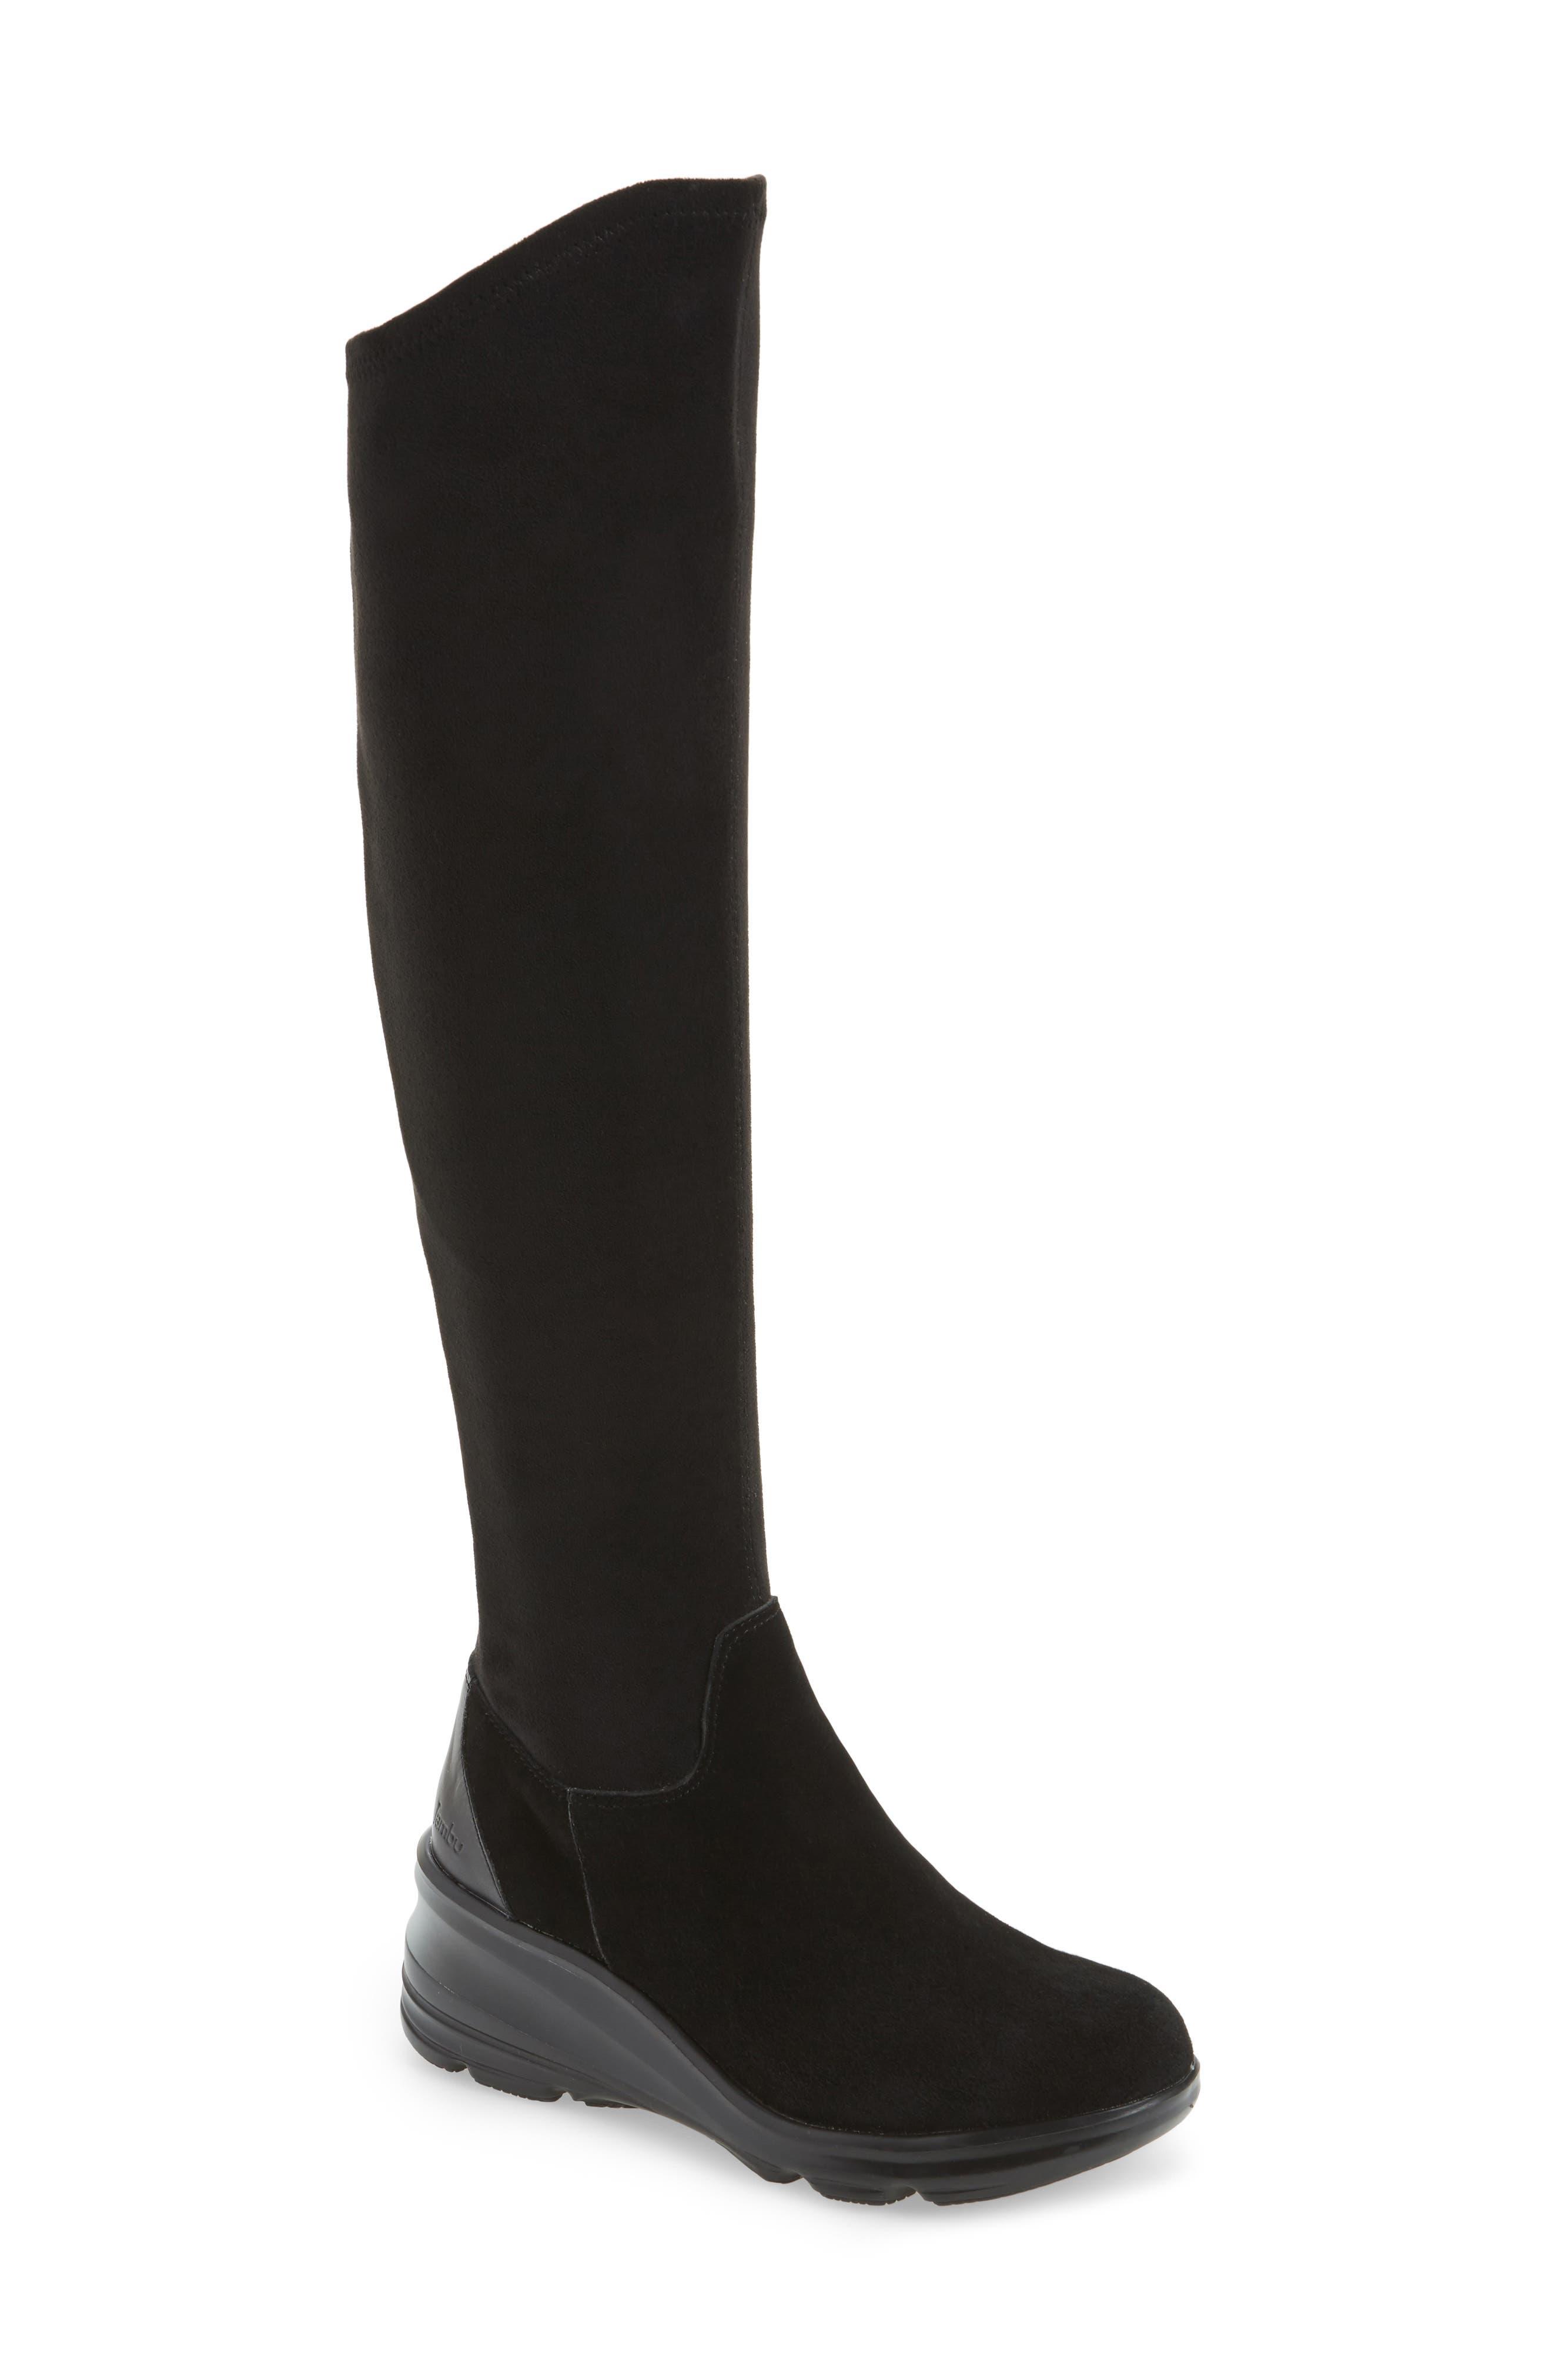 Alternate Image 1 Selected - Jambu Kendra Over the Knee Water-Resistant Boot (Women)